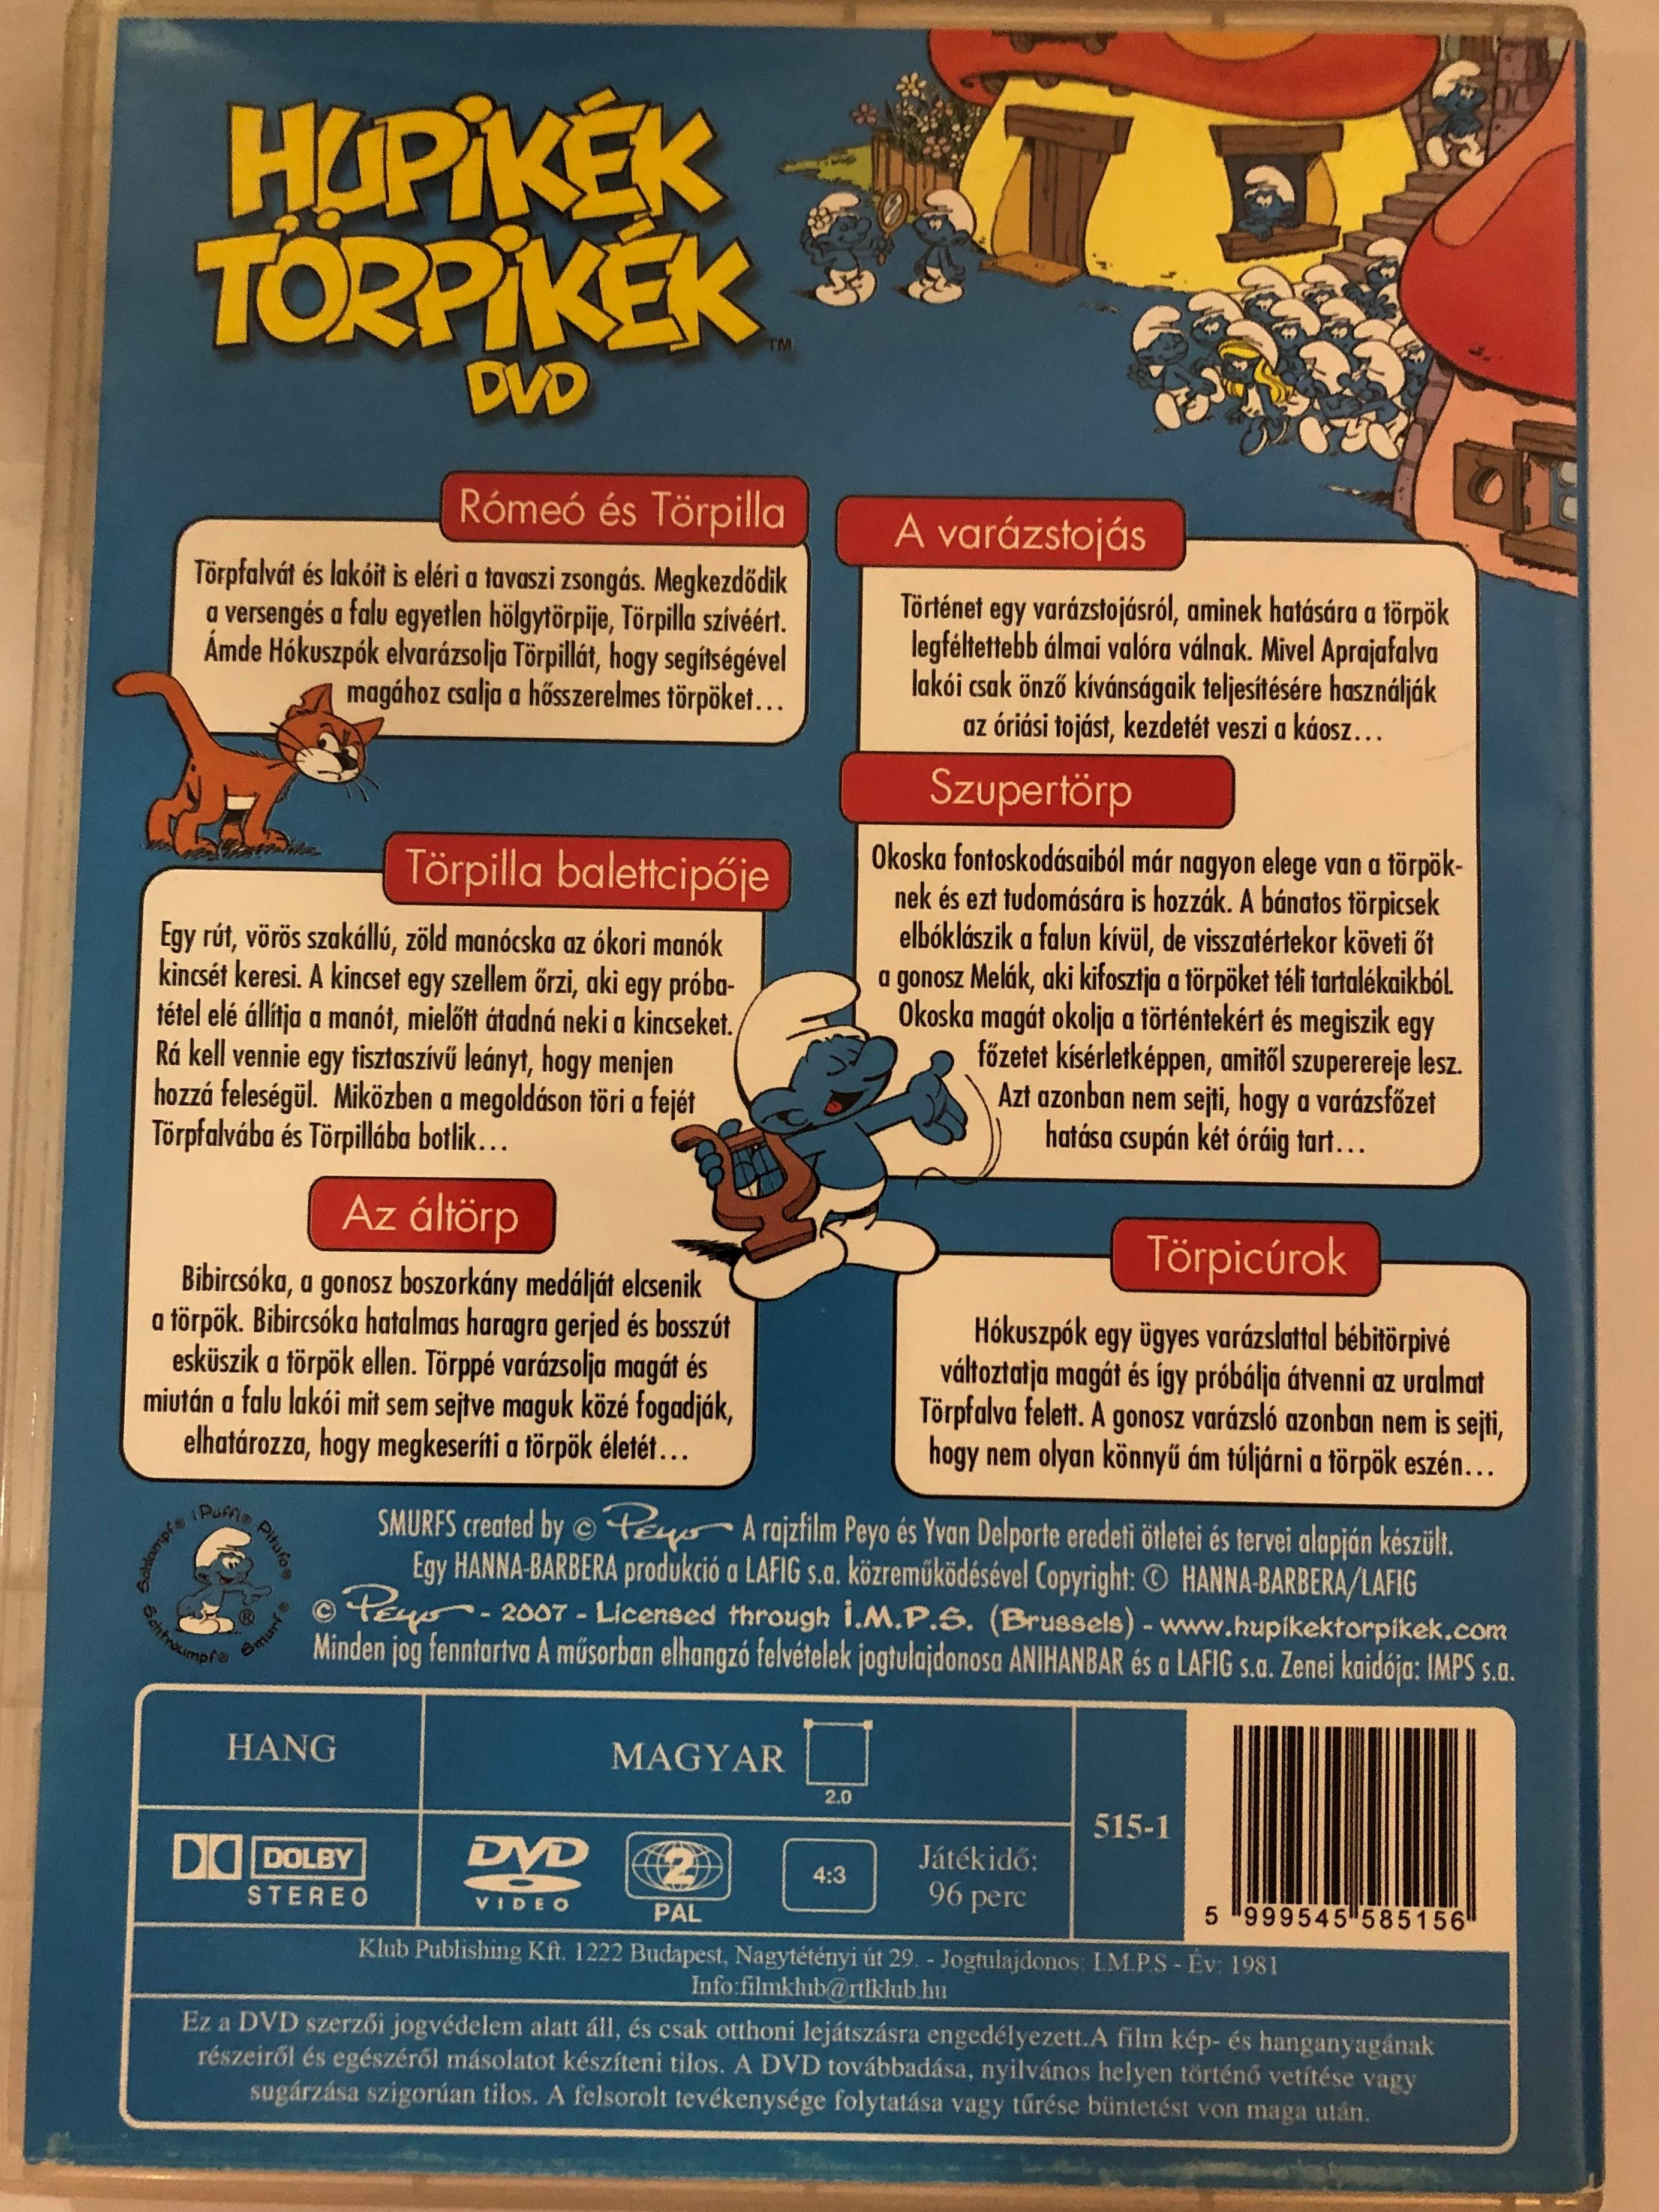 smurfs-3-dvd-1981-hupik-k-t-rpik-k-3-a-var-zstoj-s-2.jpg